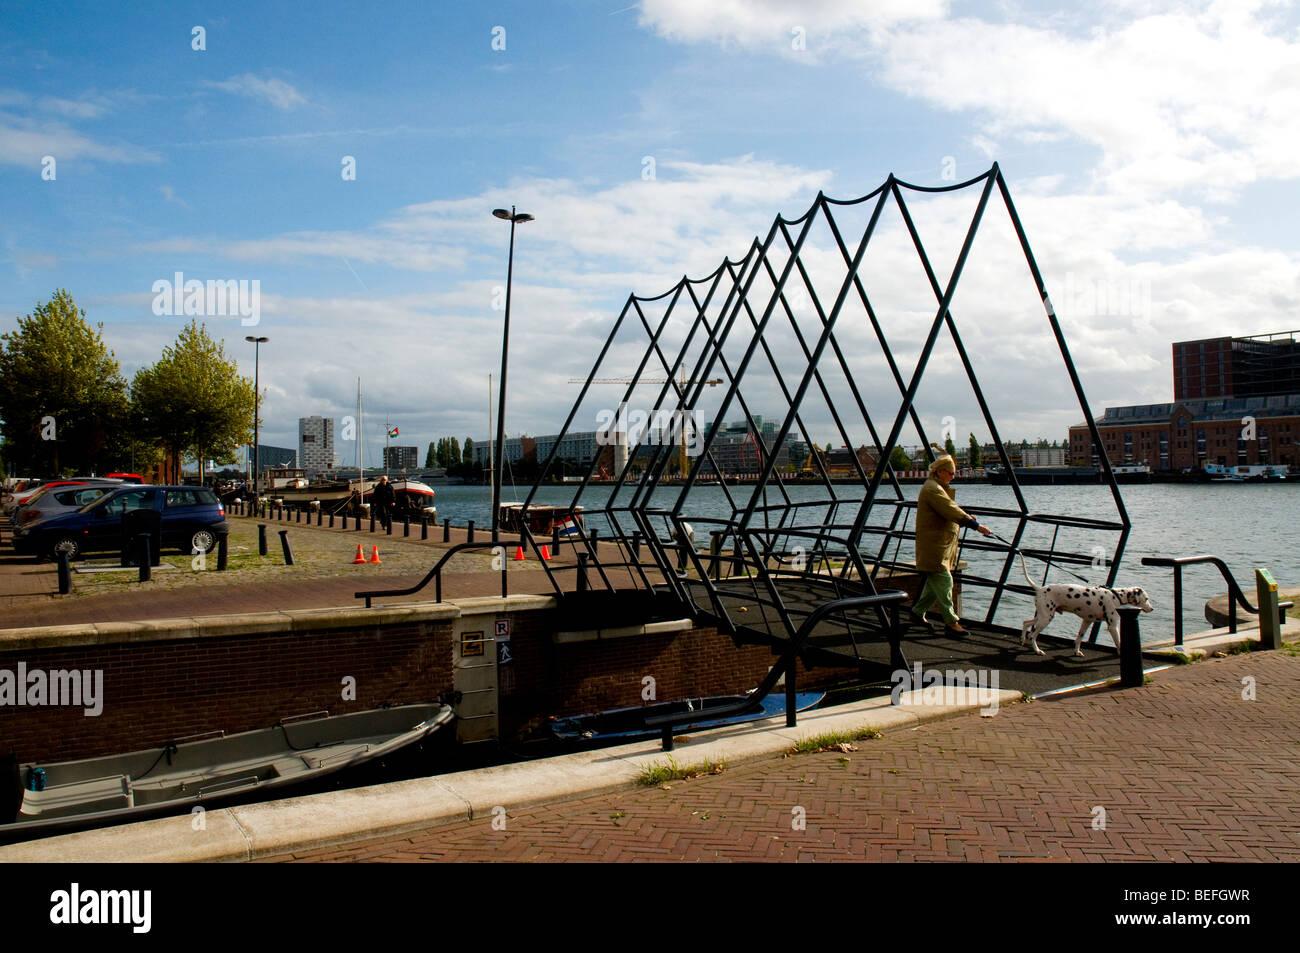 Bridge in Java Eiland, Amsterdam, Holland, Netherlands - Stock Image